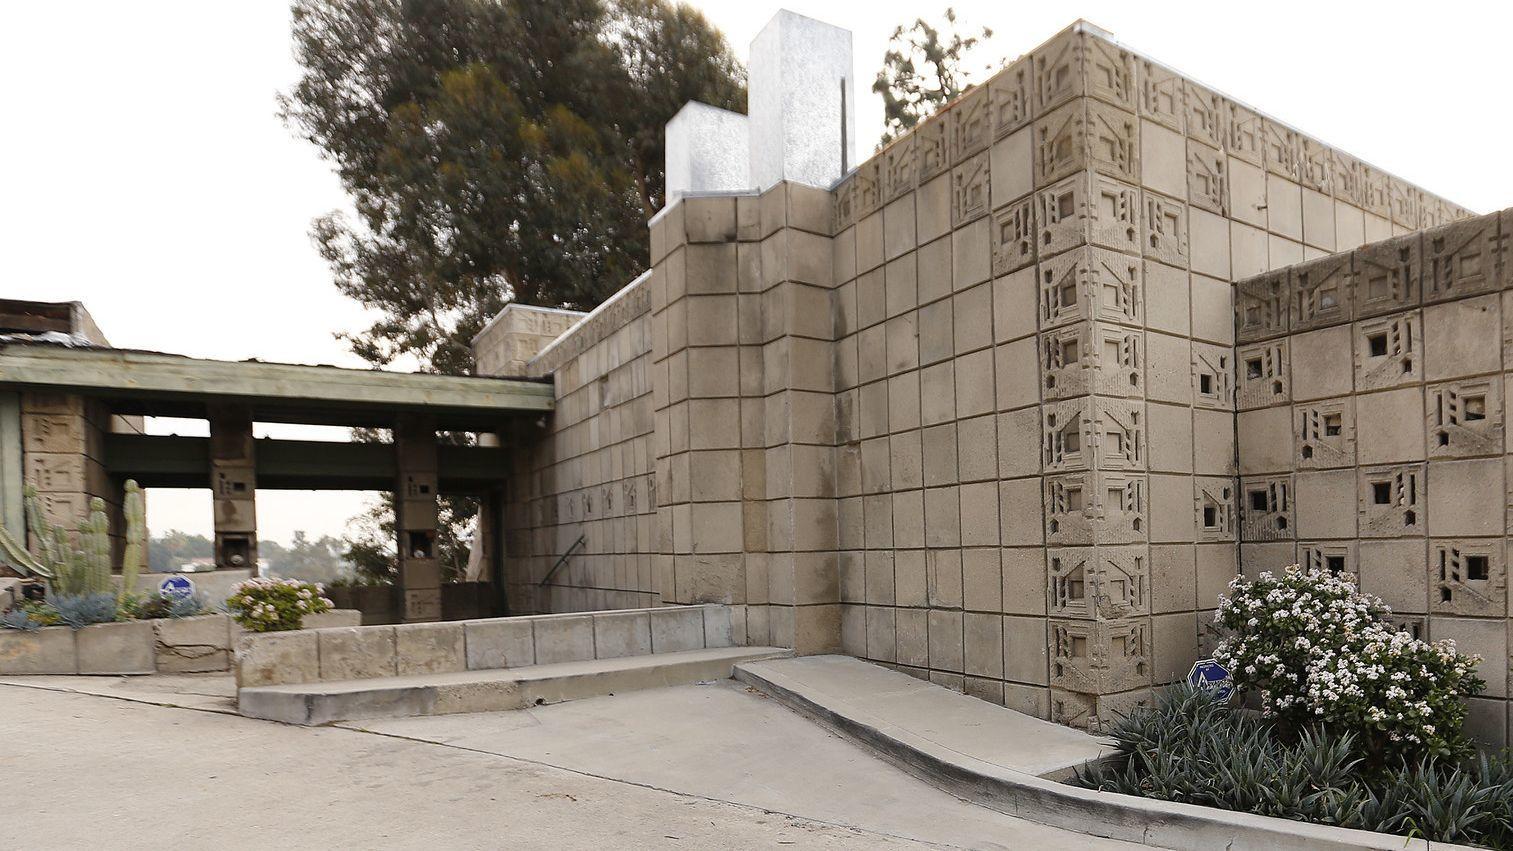 Frank Lloyd Wright's Freeman House is seen in 2019. [Al Seib / Los Angeles Times]